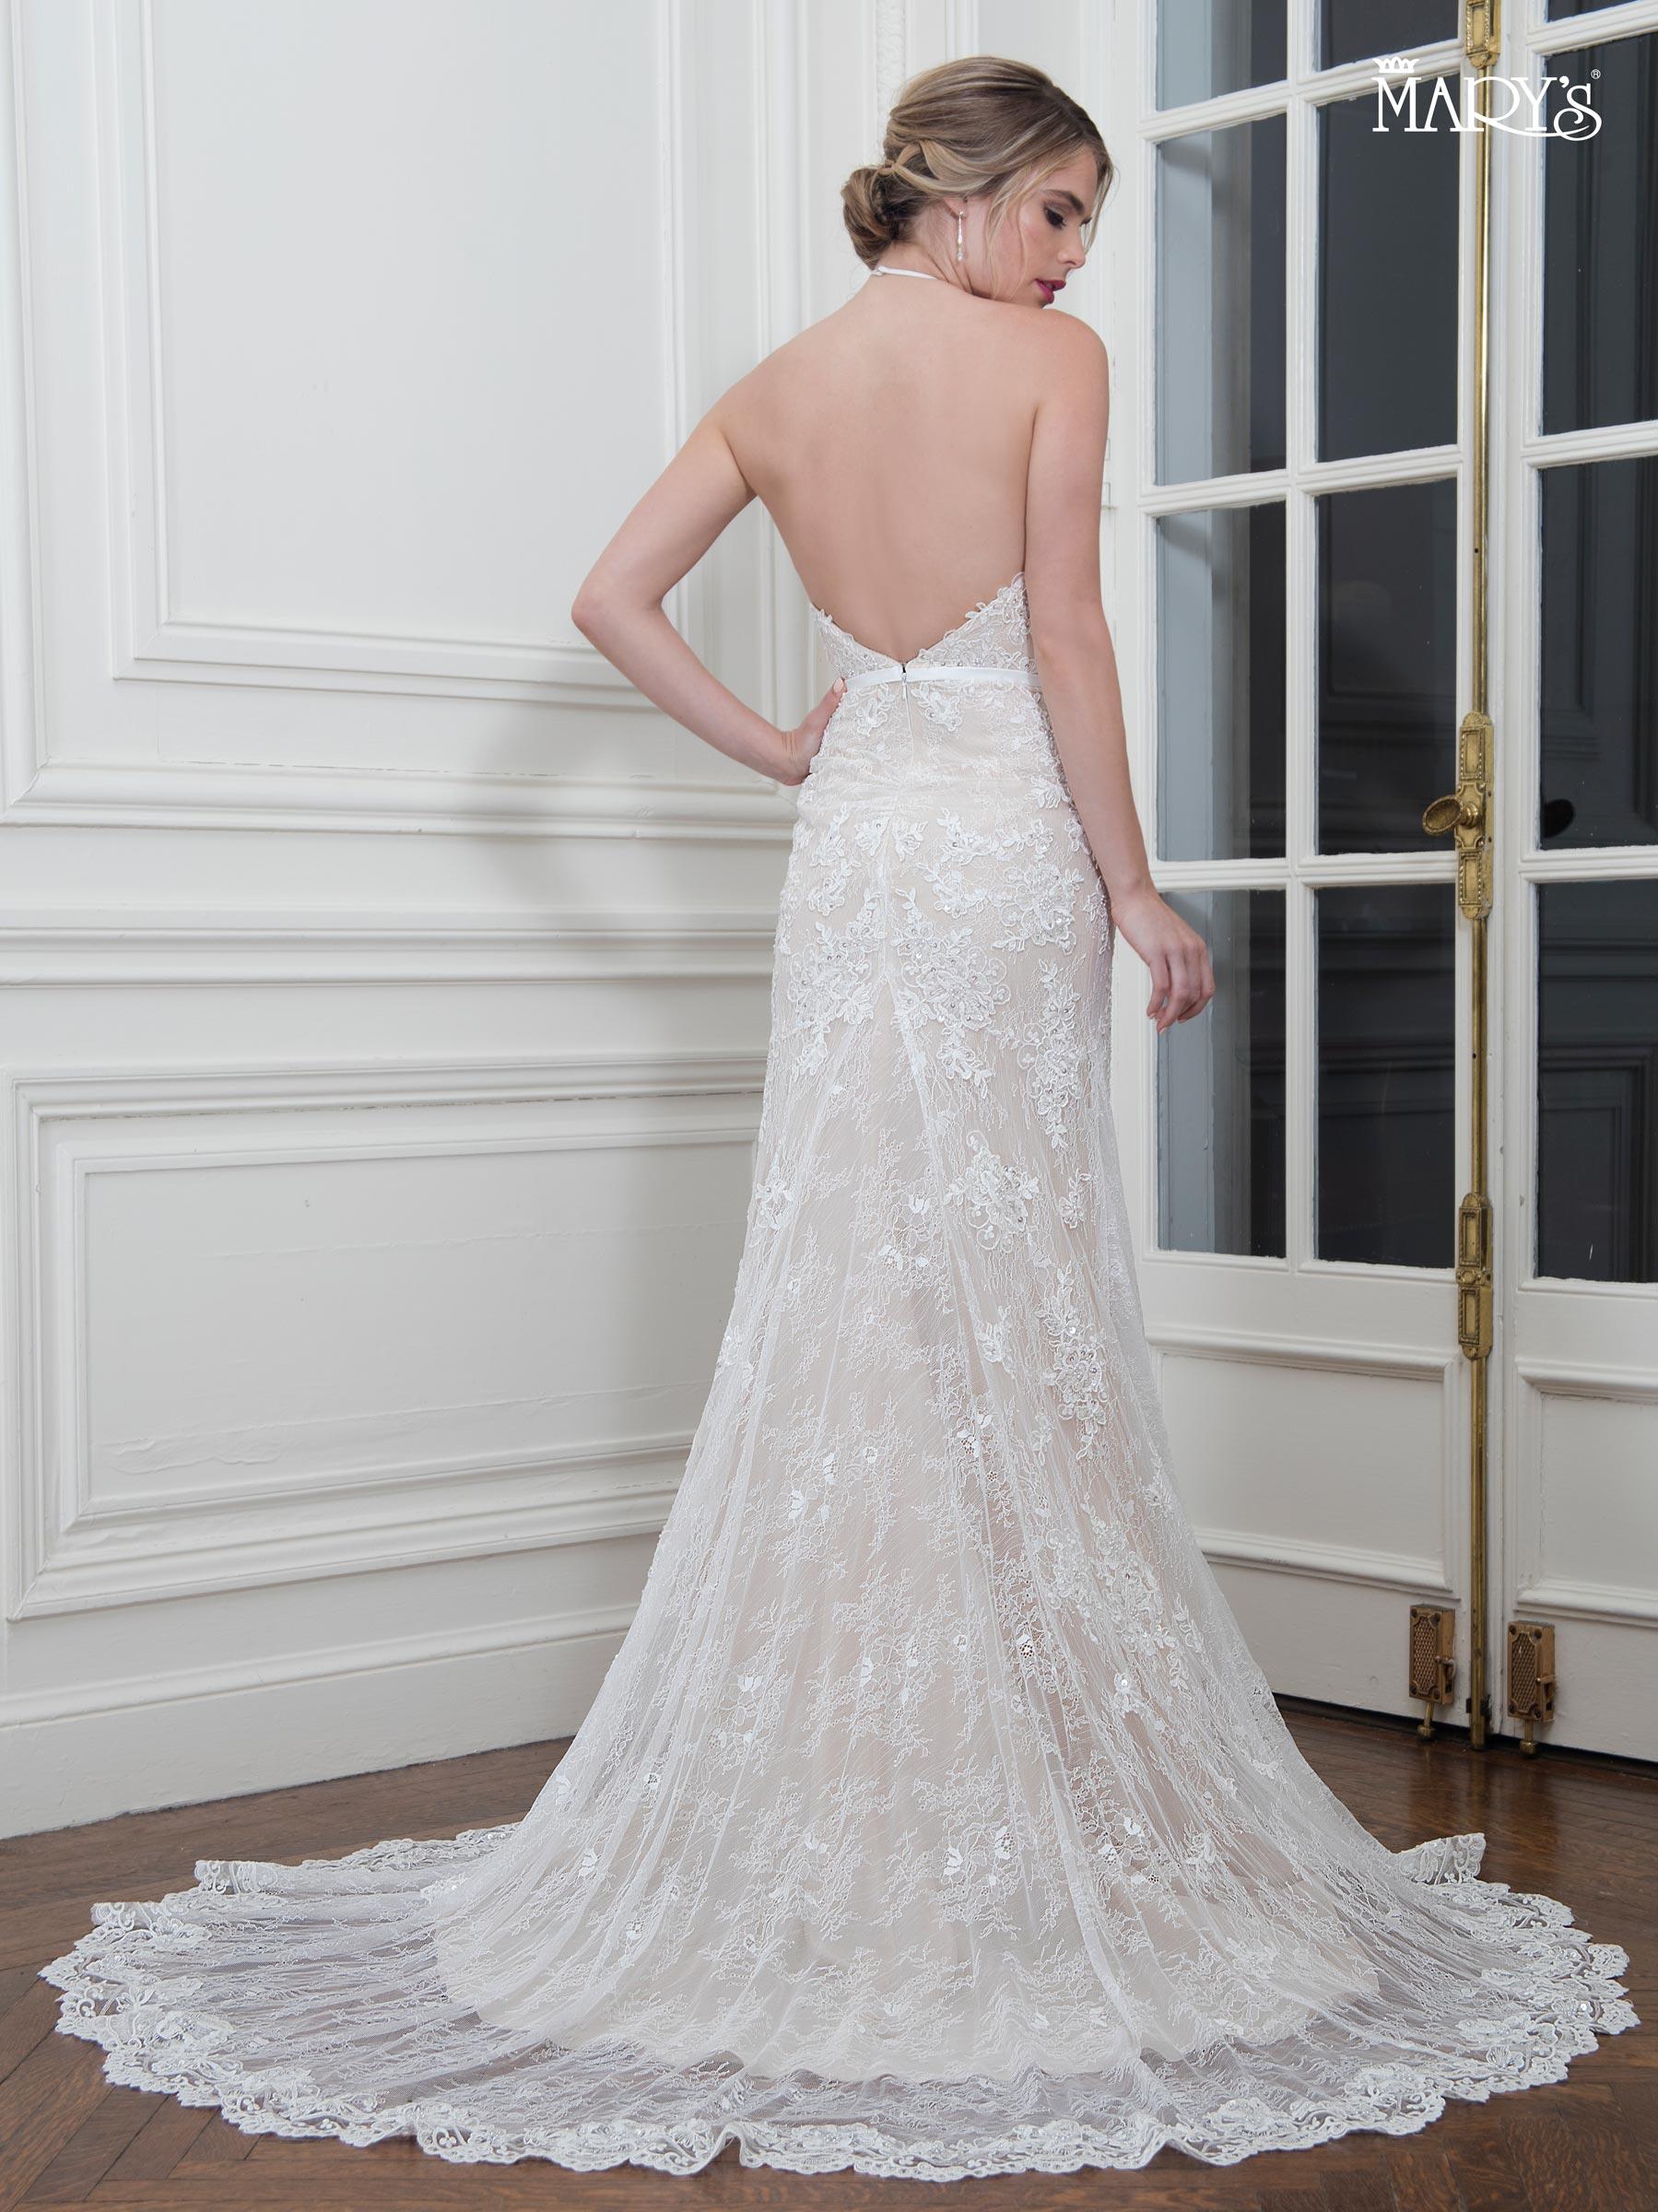 Bridal Wedding Dresses | Mary's | Style - MB3011